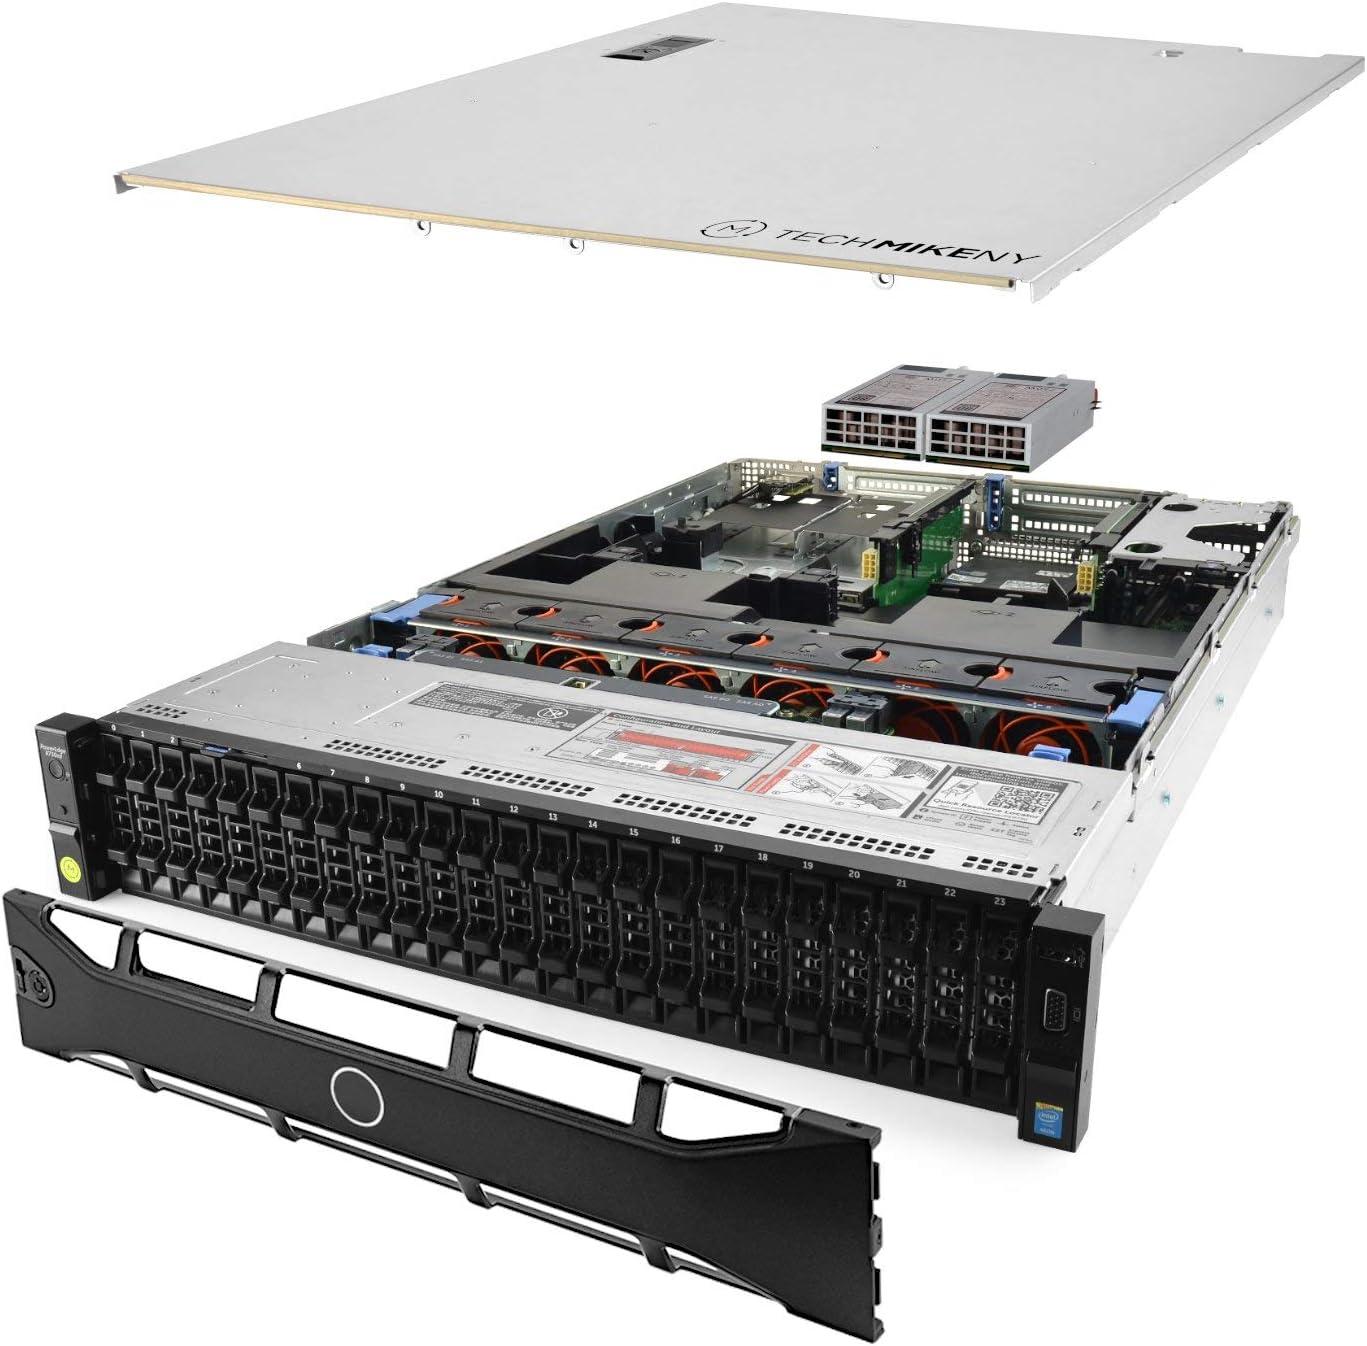 quality assurance TechMikeNY Server 2.60Ghz 24-Core 288GB PowerE 600GB Latest item 12G 15K 24x